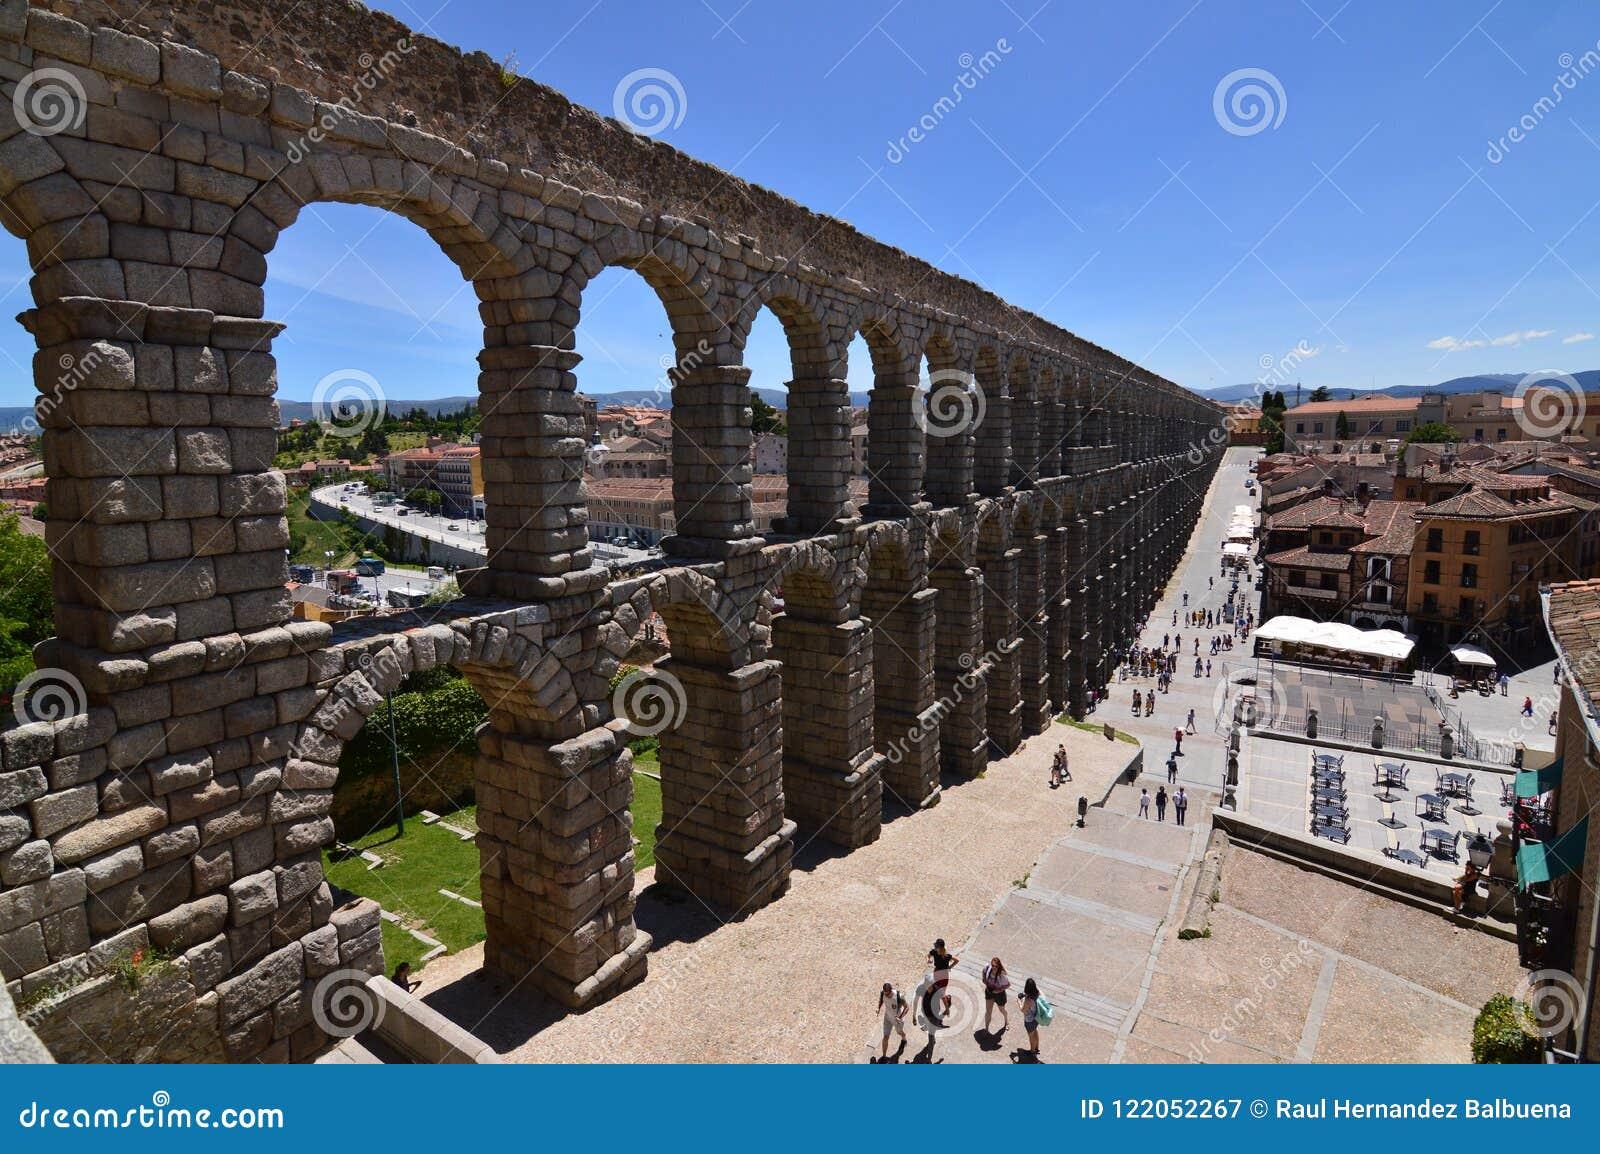 Sned sida som skjutas av akvedukten i Segovia Arkitektur lopp, historia